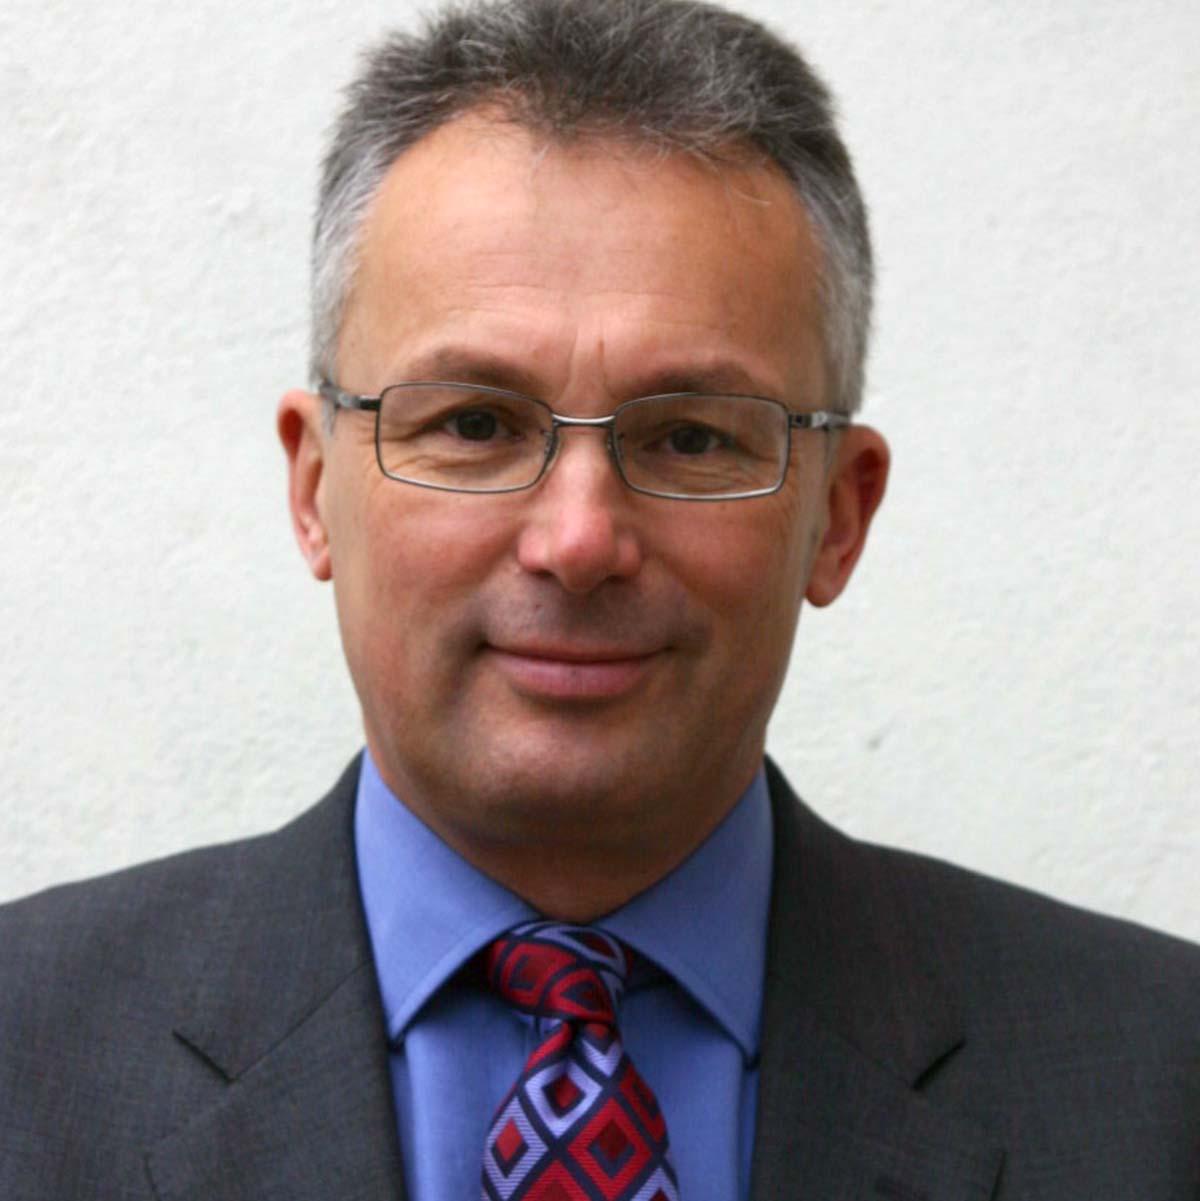 Philip Forrester